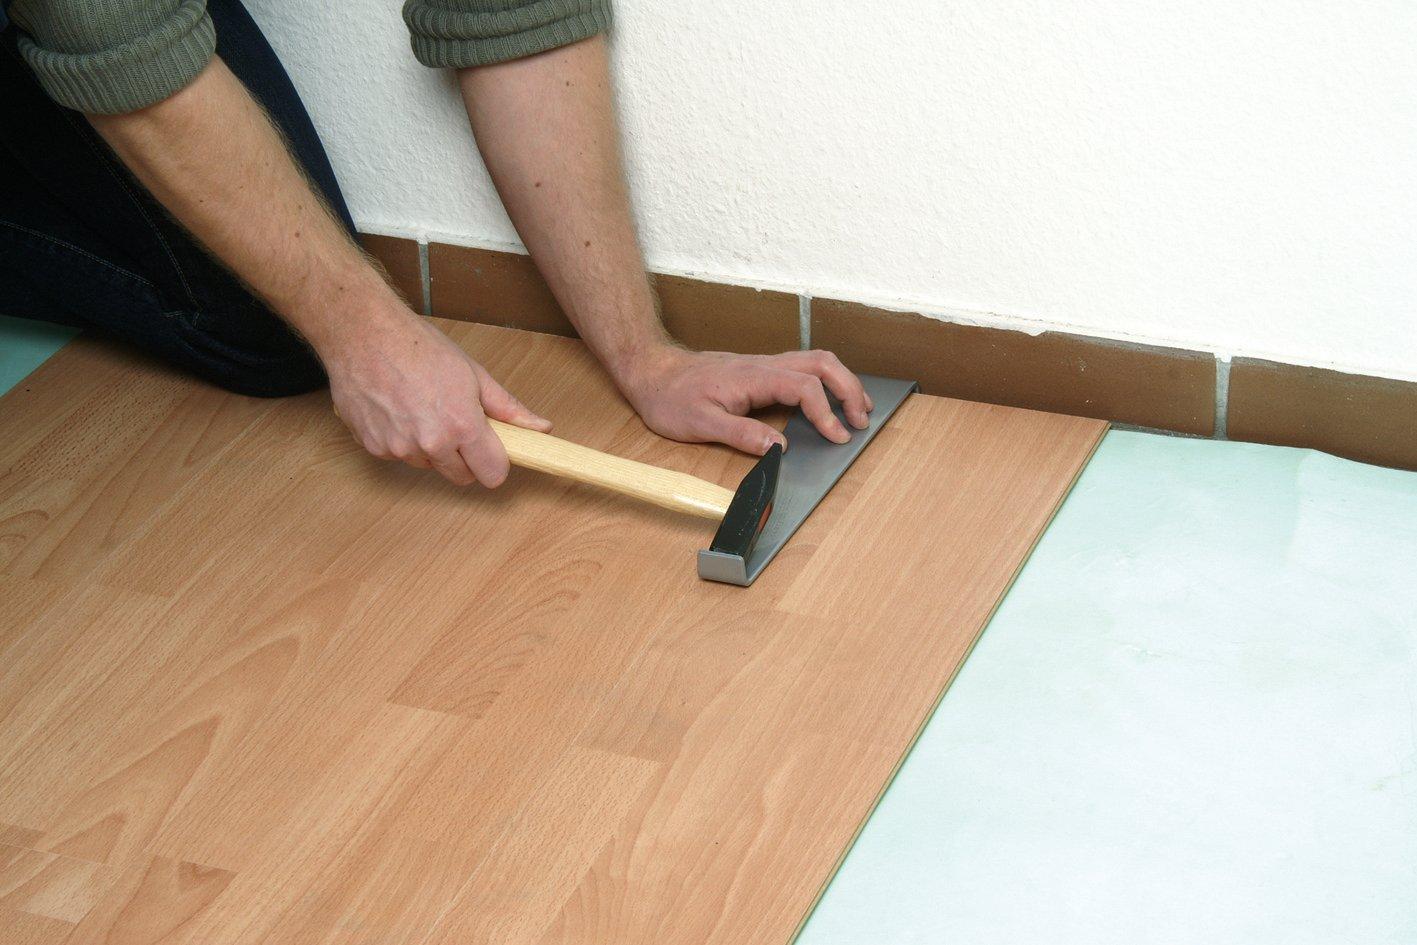 Fußboden Verlegen Werkzeug ~ Obi pvc fußbodenbelag verlegen